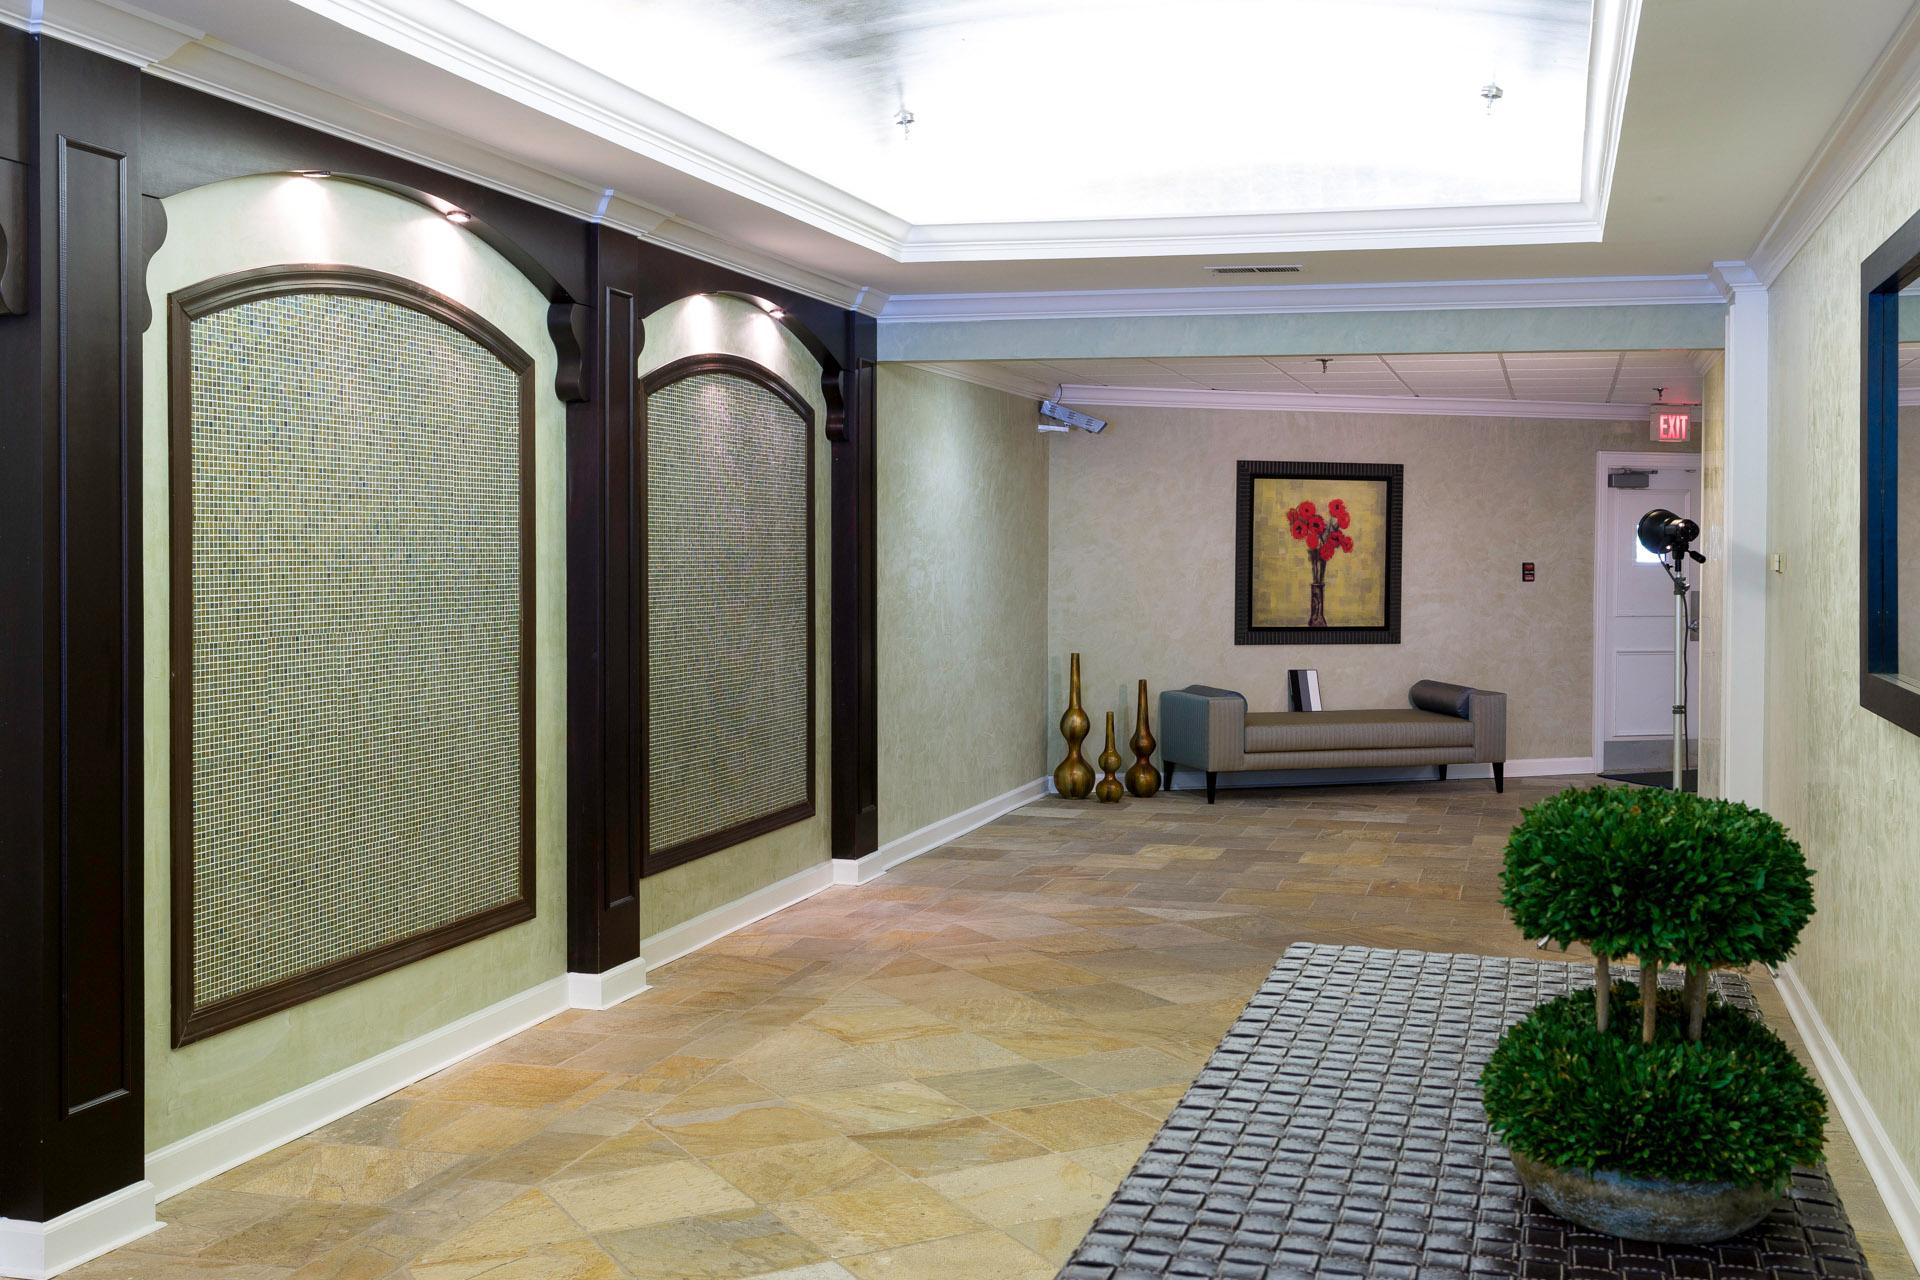 Interiors of Lenox Pointe Condominiums for Brainstorm Design Works Estimate #91101-22 Lobby-Hallway